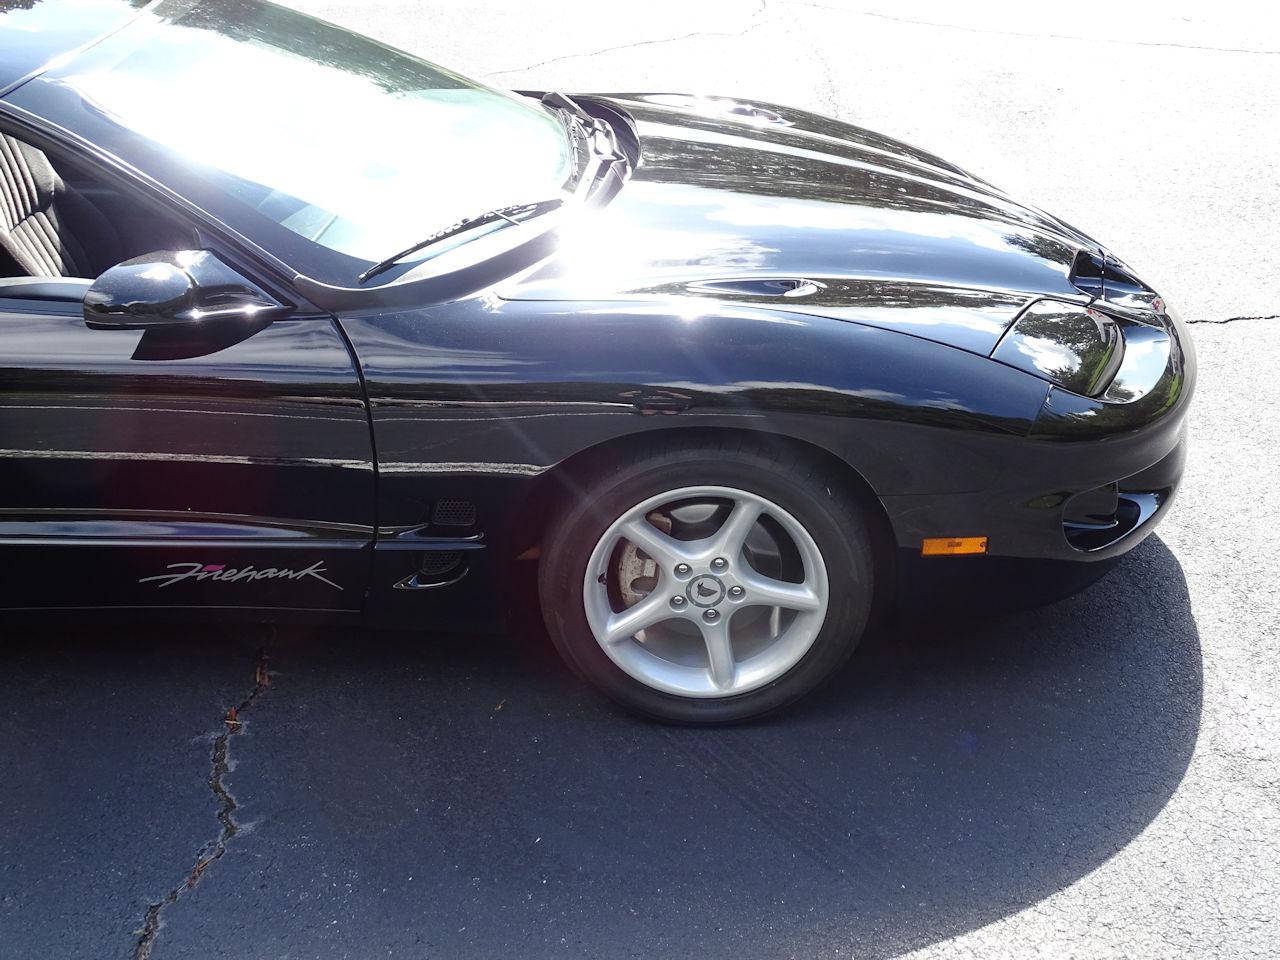 2001 Pontiac Firebird 53